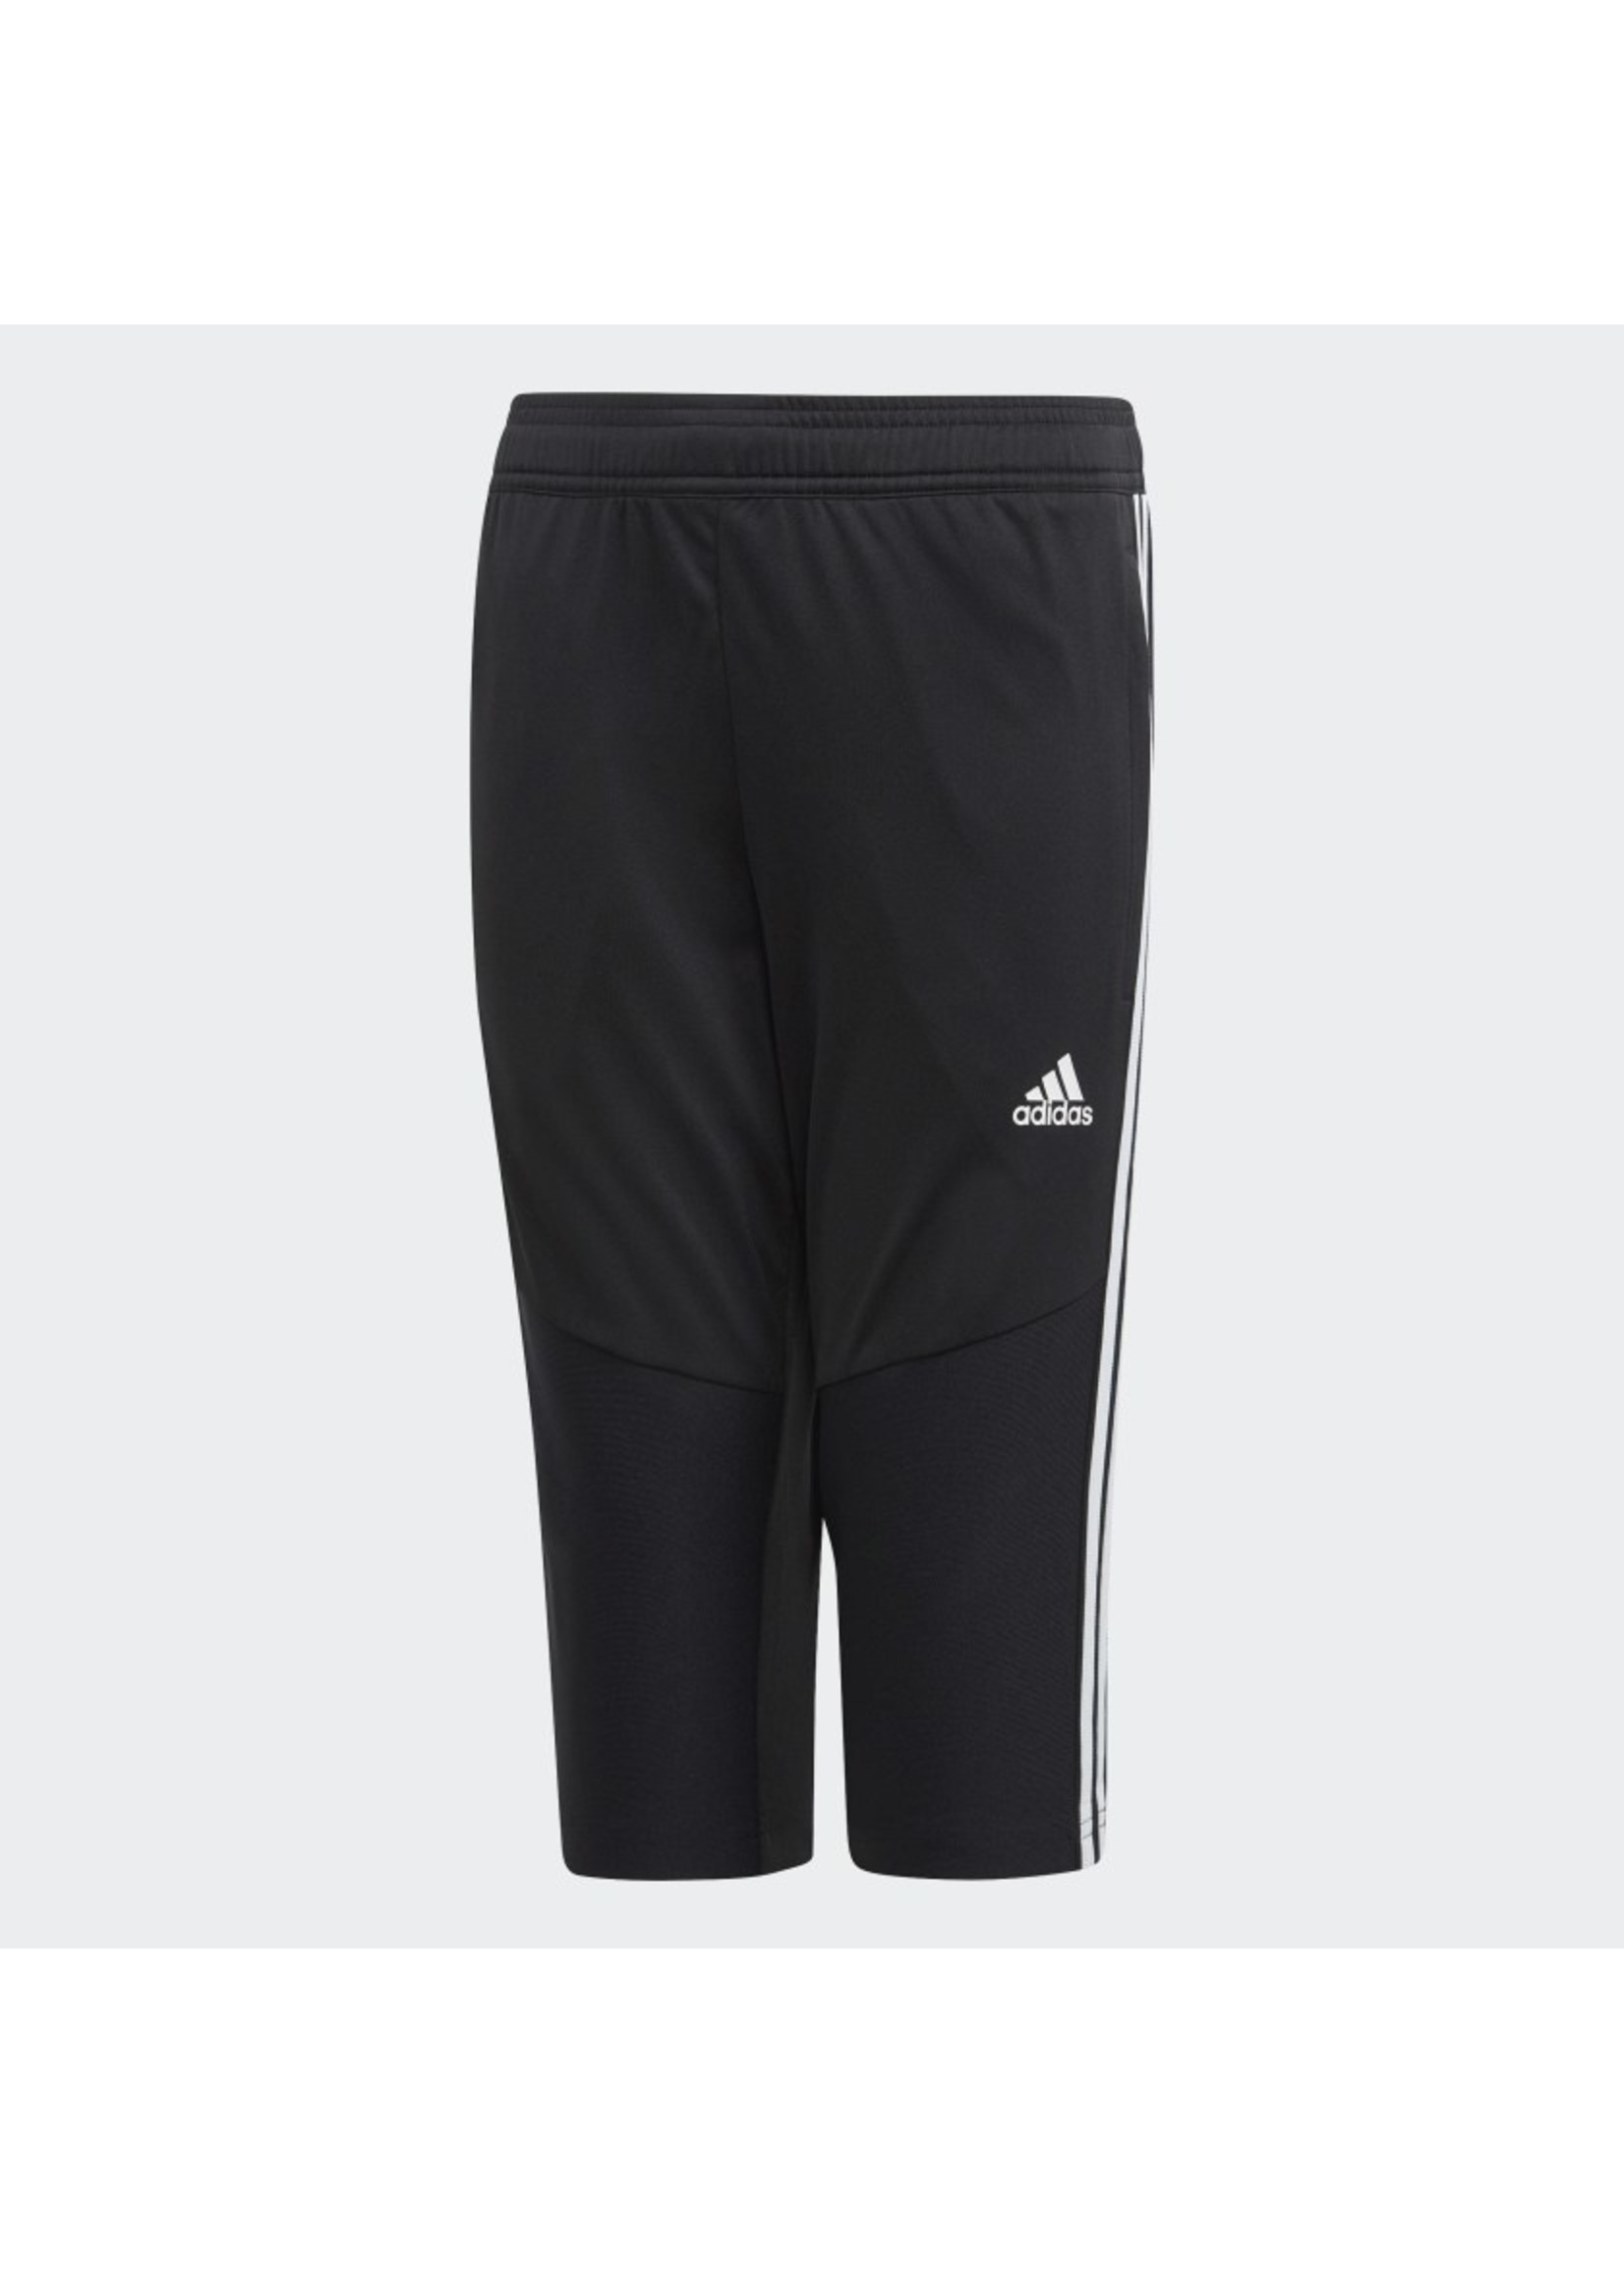 Adidas Tiro19 3/4 Pant Youth